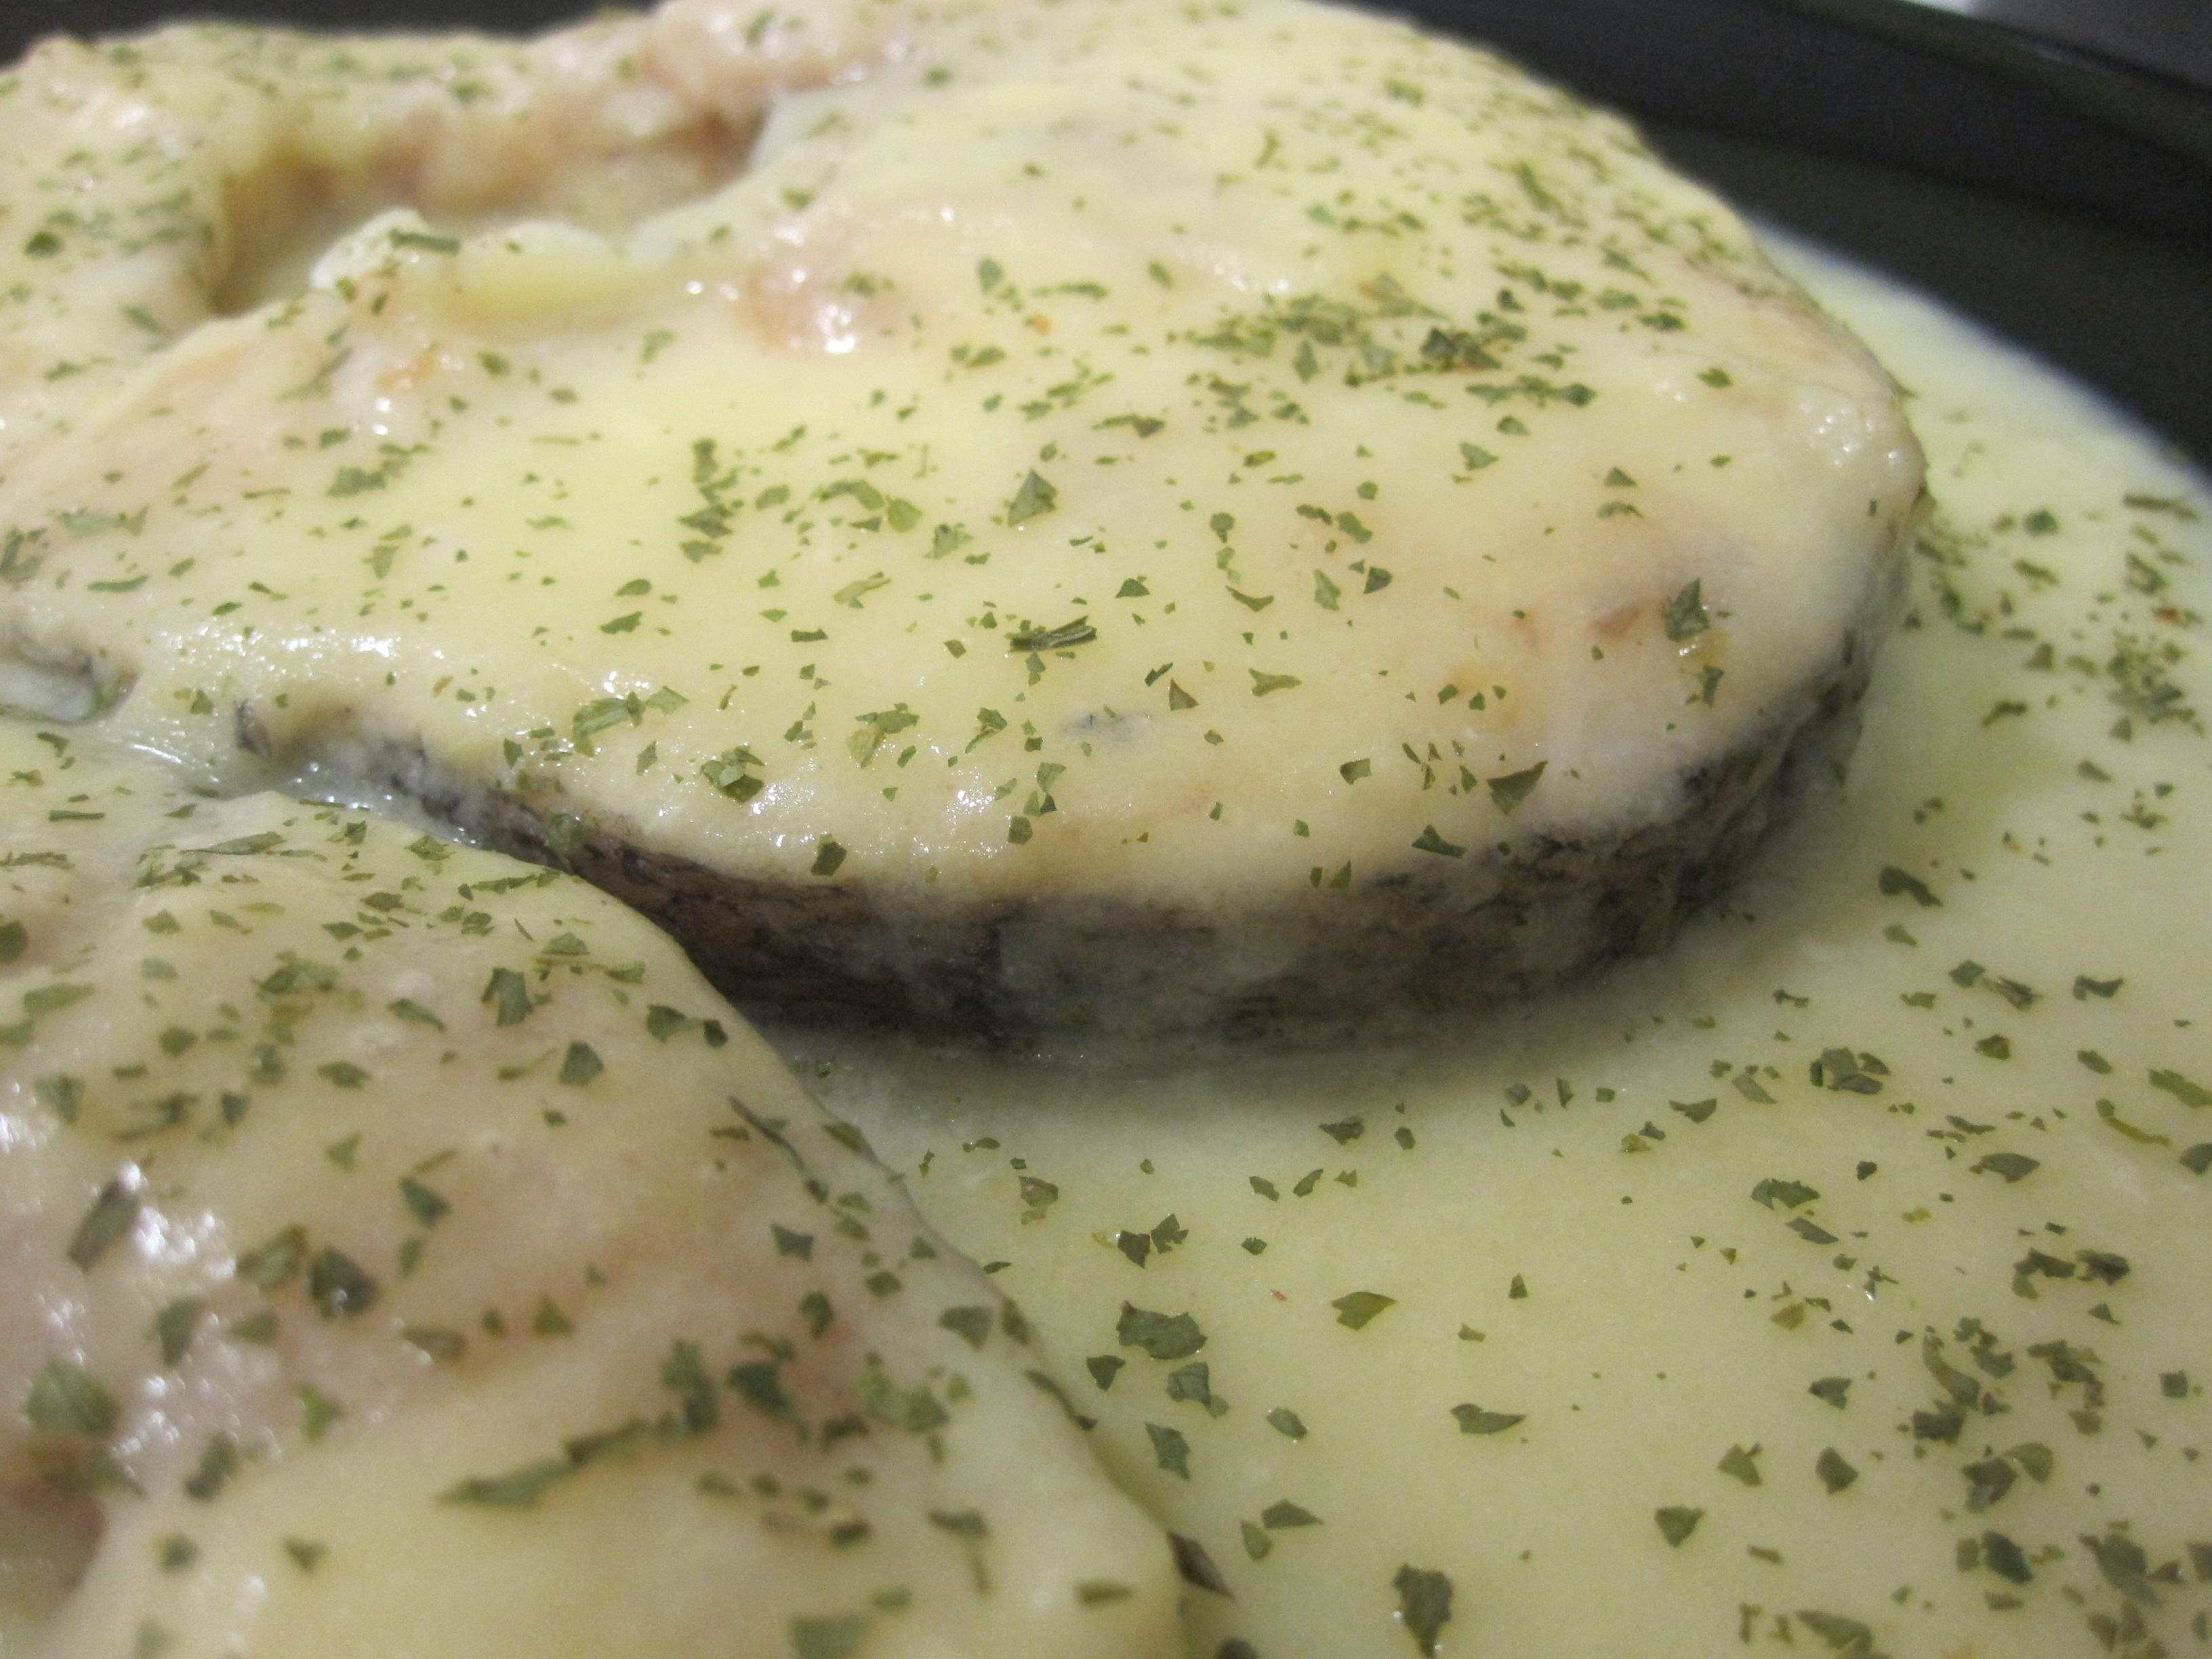 Merluza en salsa de puerros mundoamores - Cocinar merluza en salsa ...